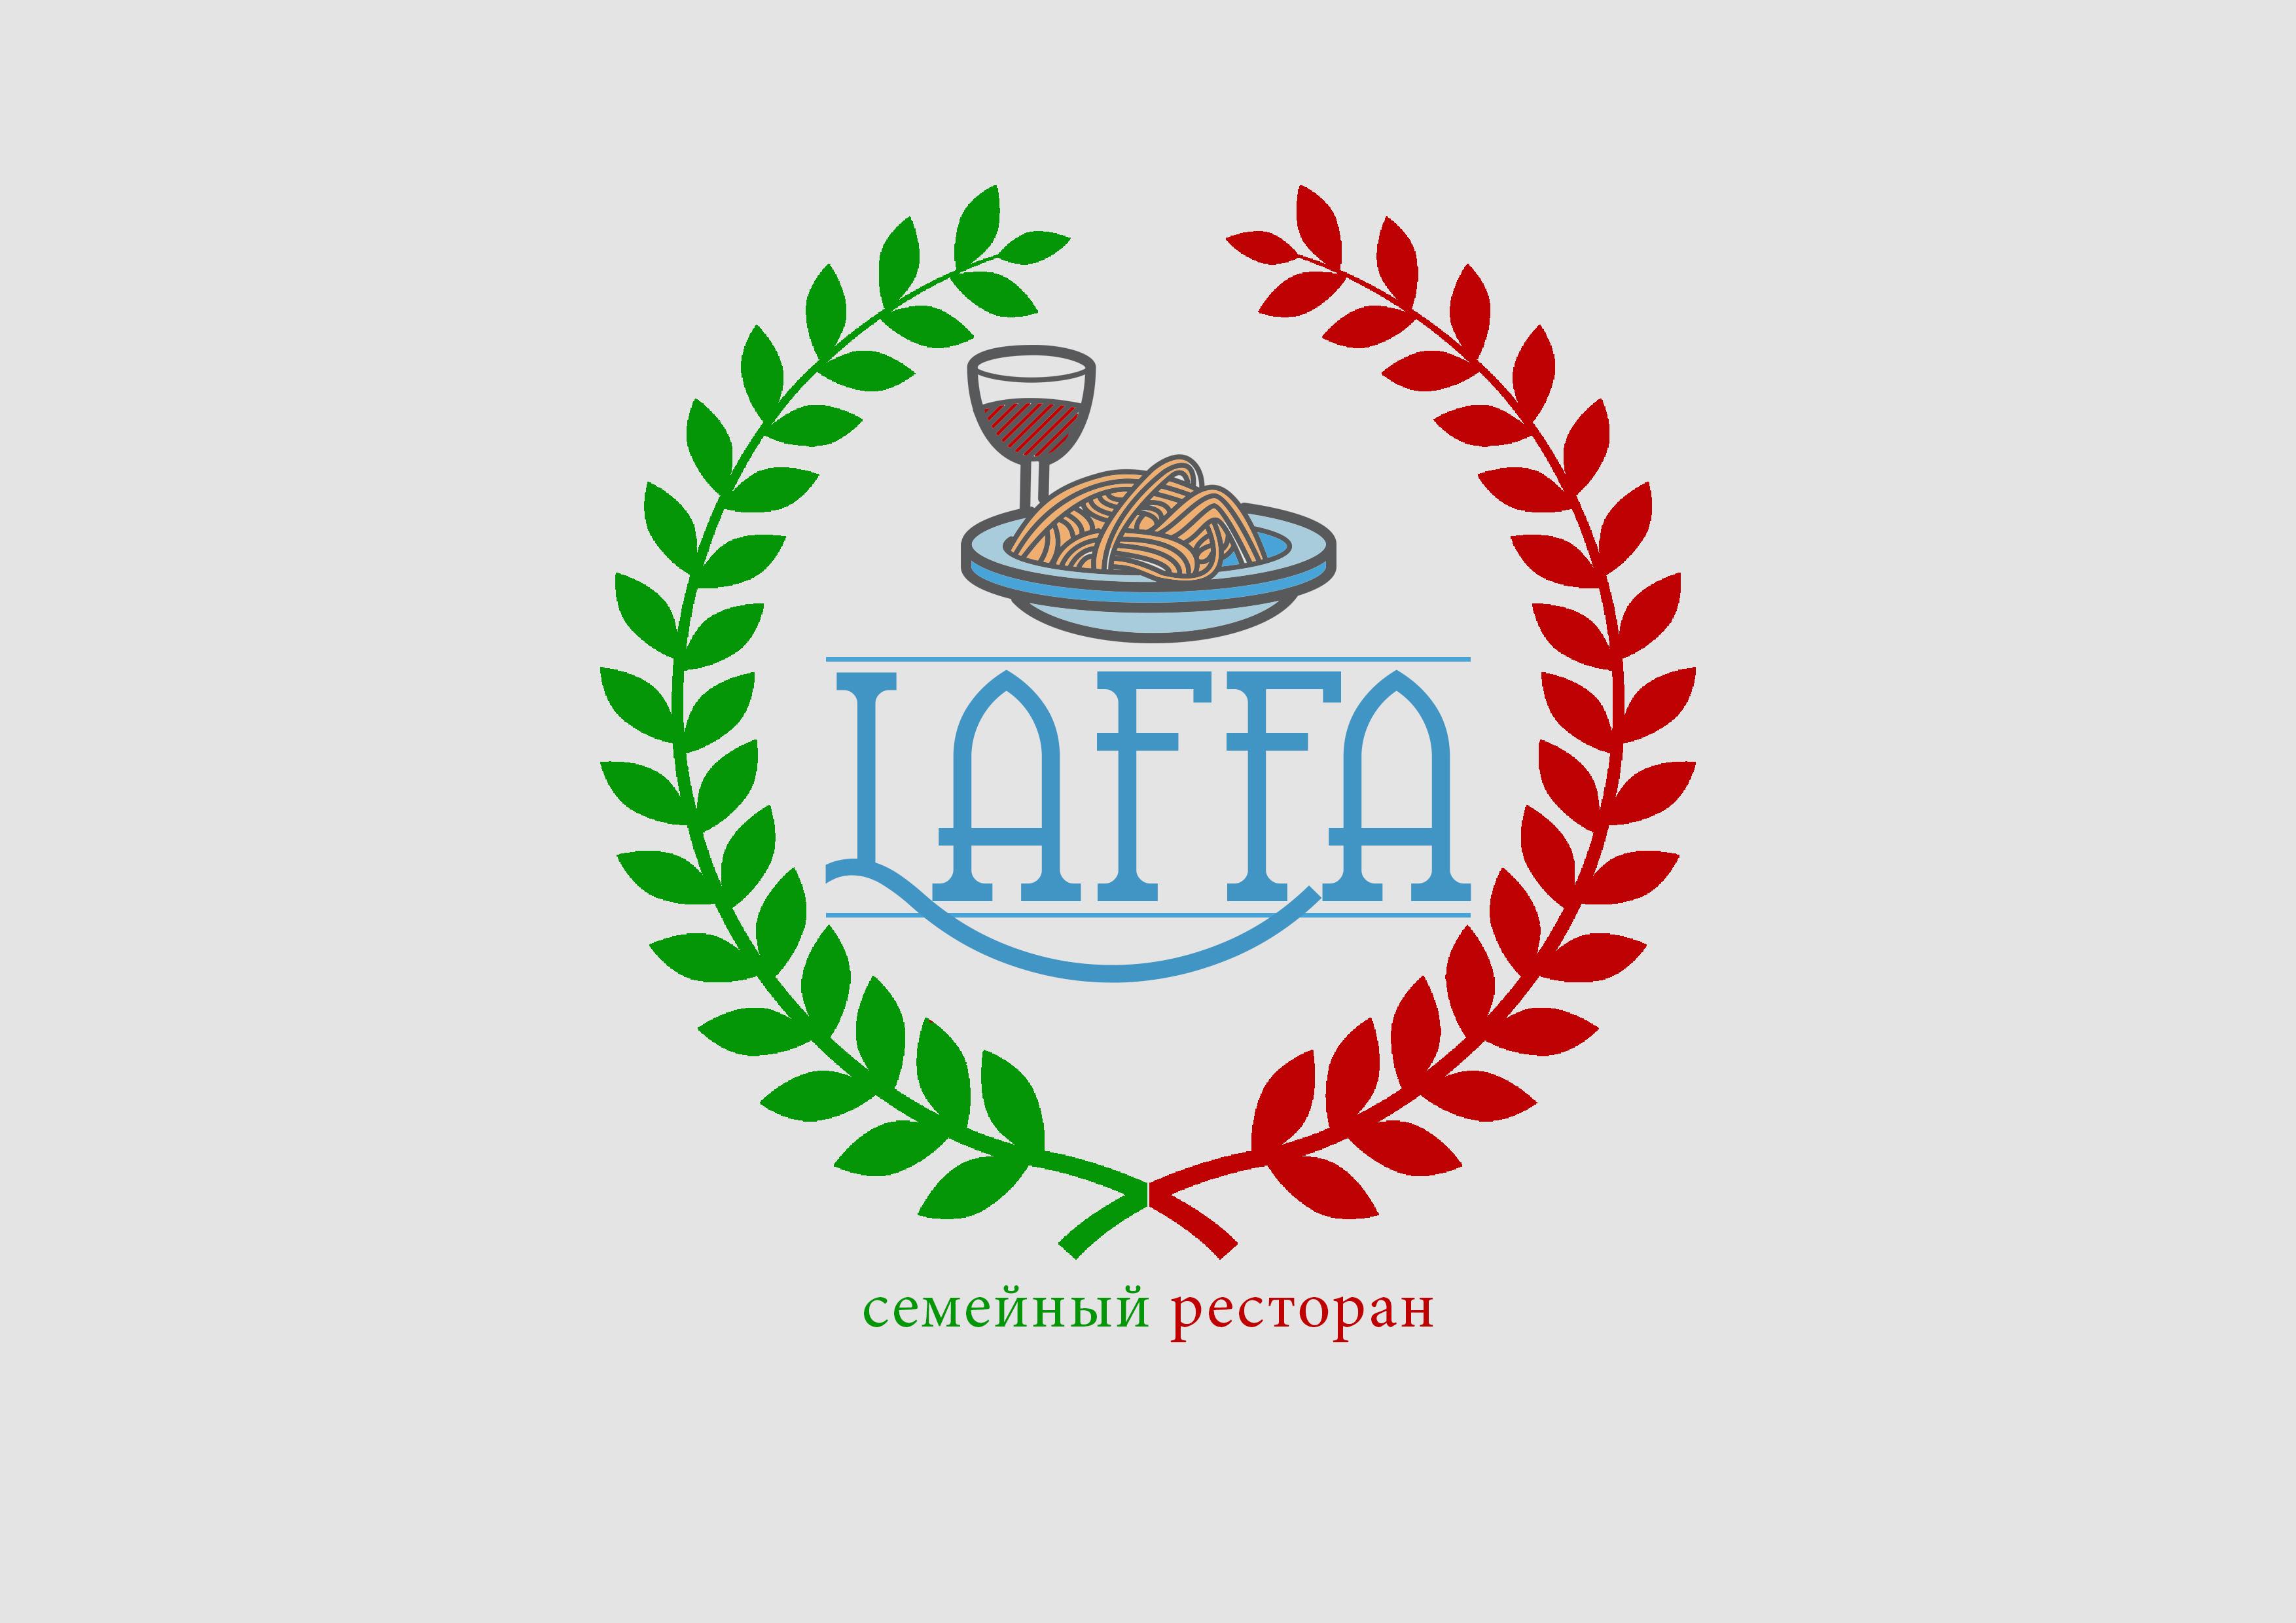 Нужно нарисовать логотип для семейного итальянского ресторан фото f_084554b3c320cd0f.jpg